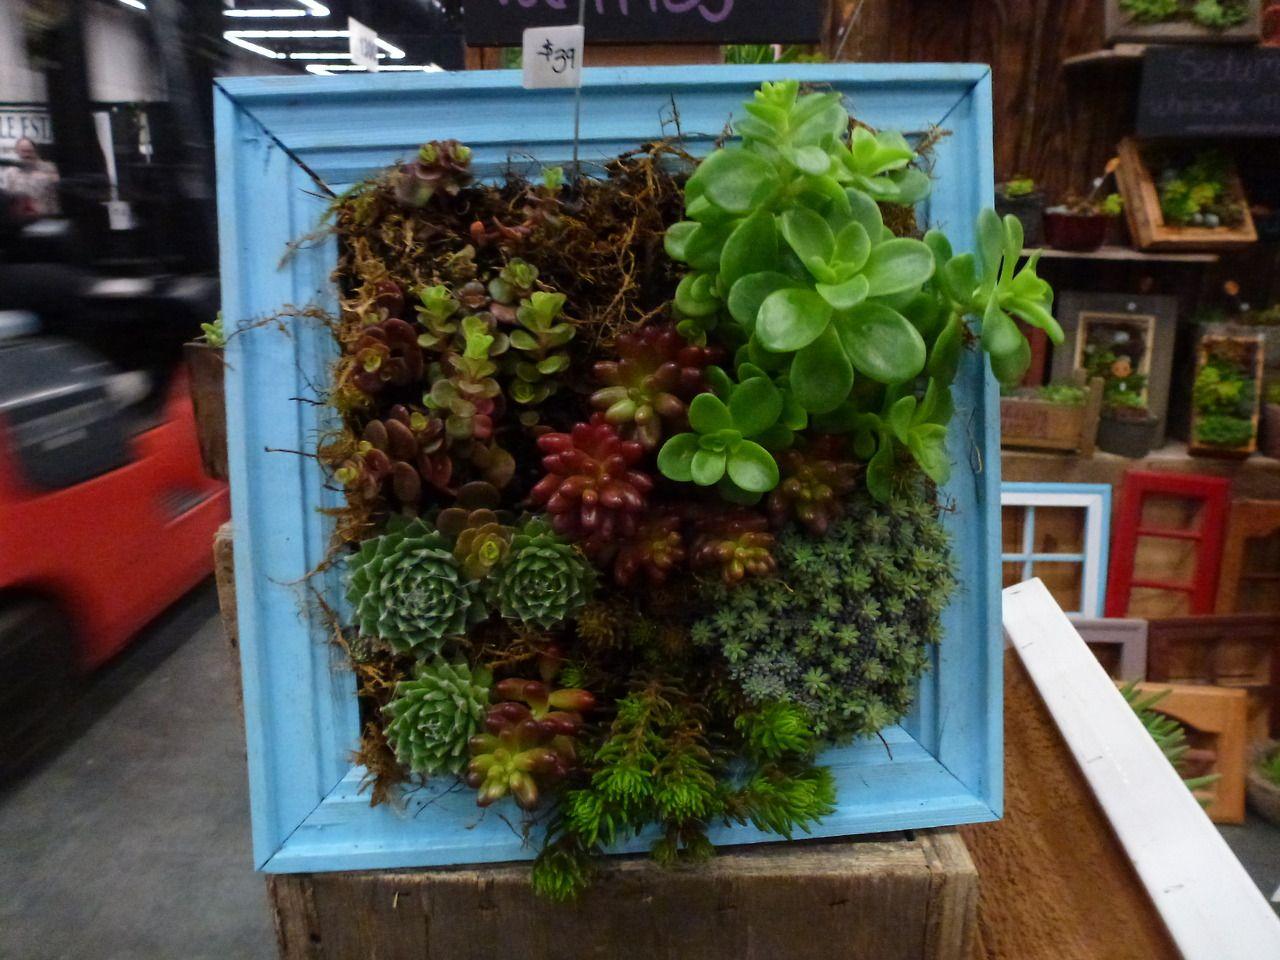 Creative Framed Succulent Arrangement By Sedum Chicks At Portlandu0027s Yard,  Garden And Patio Show.